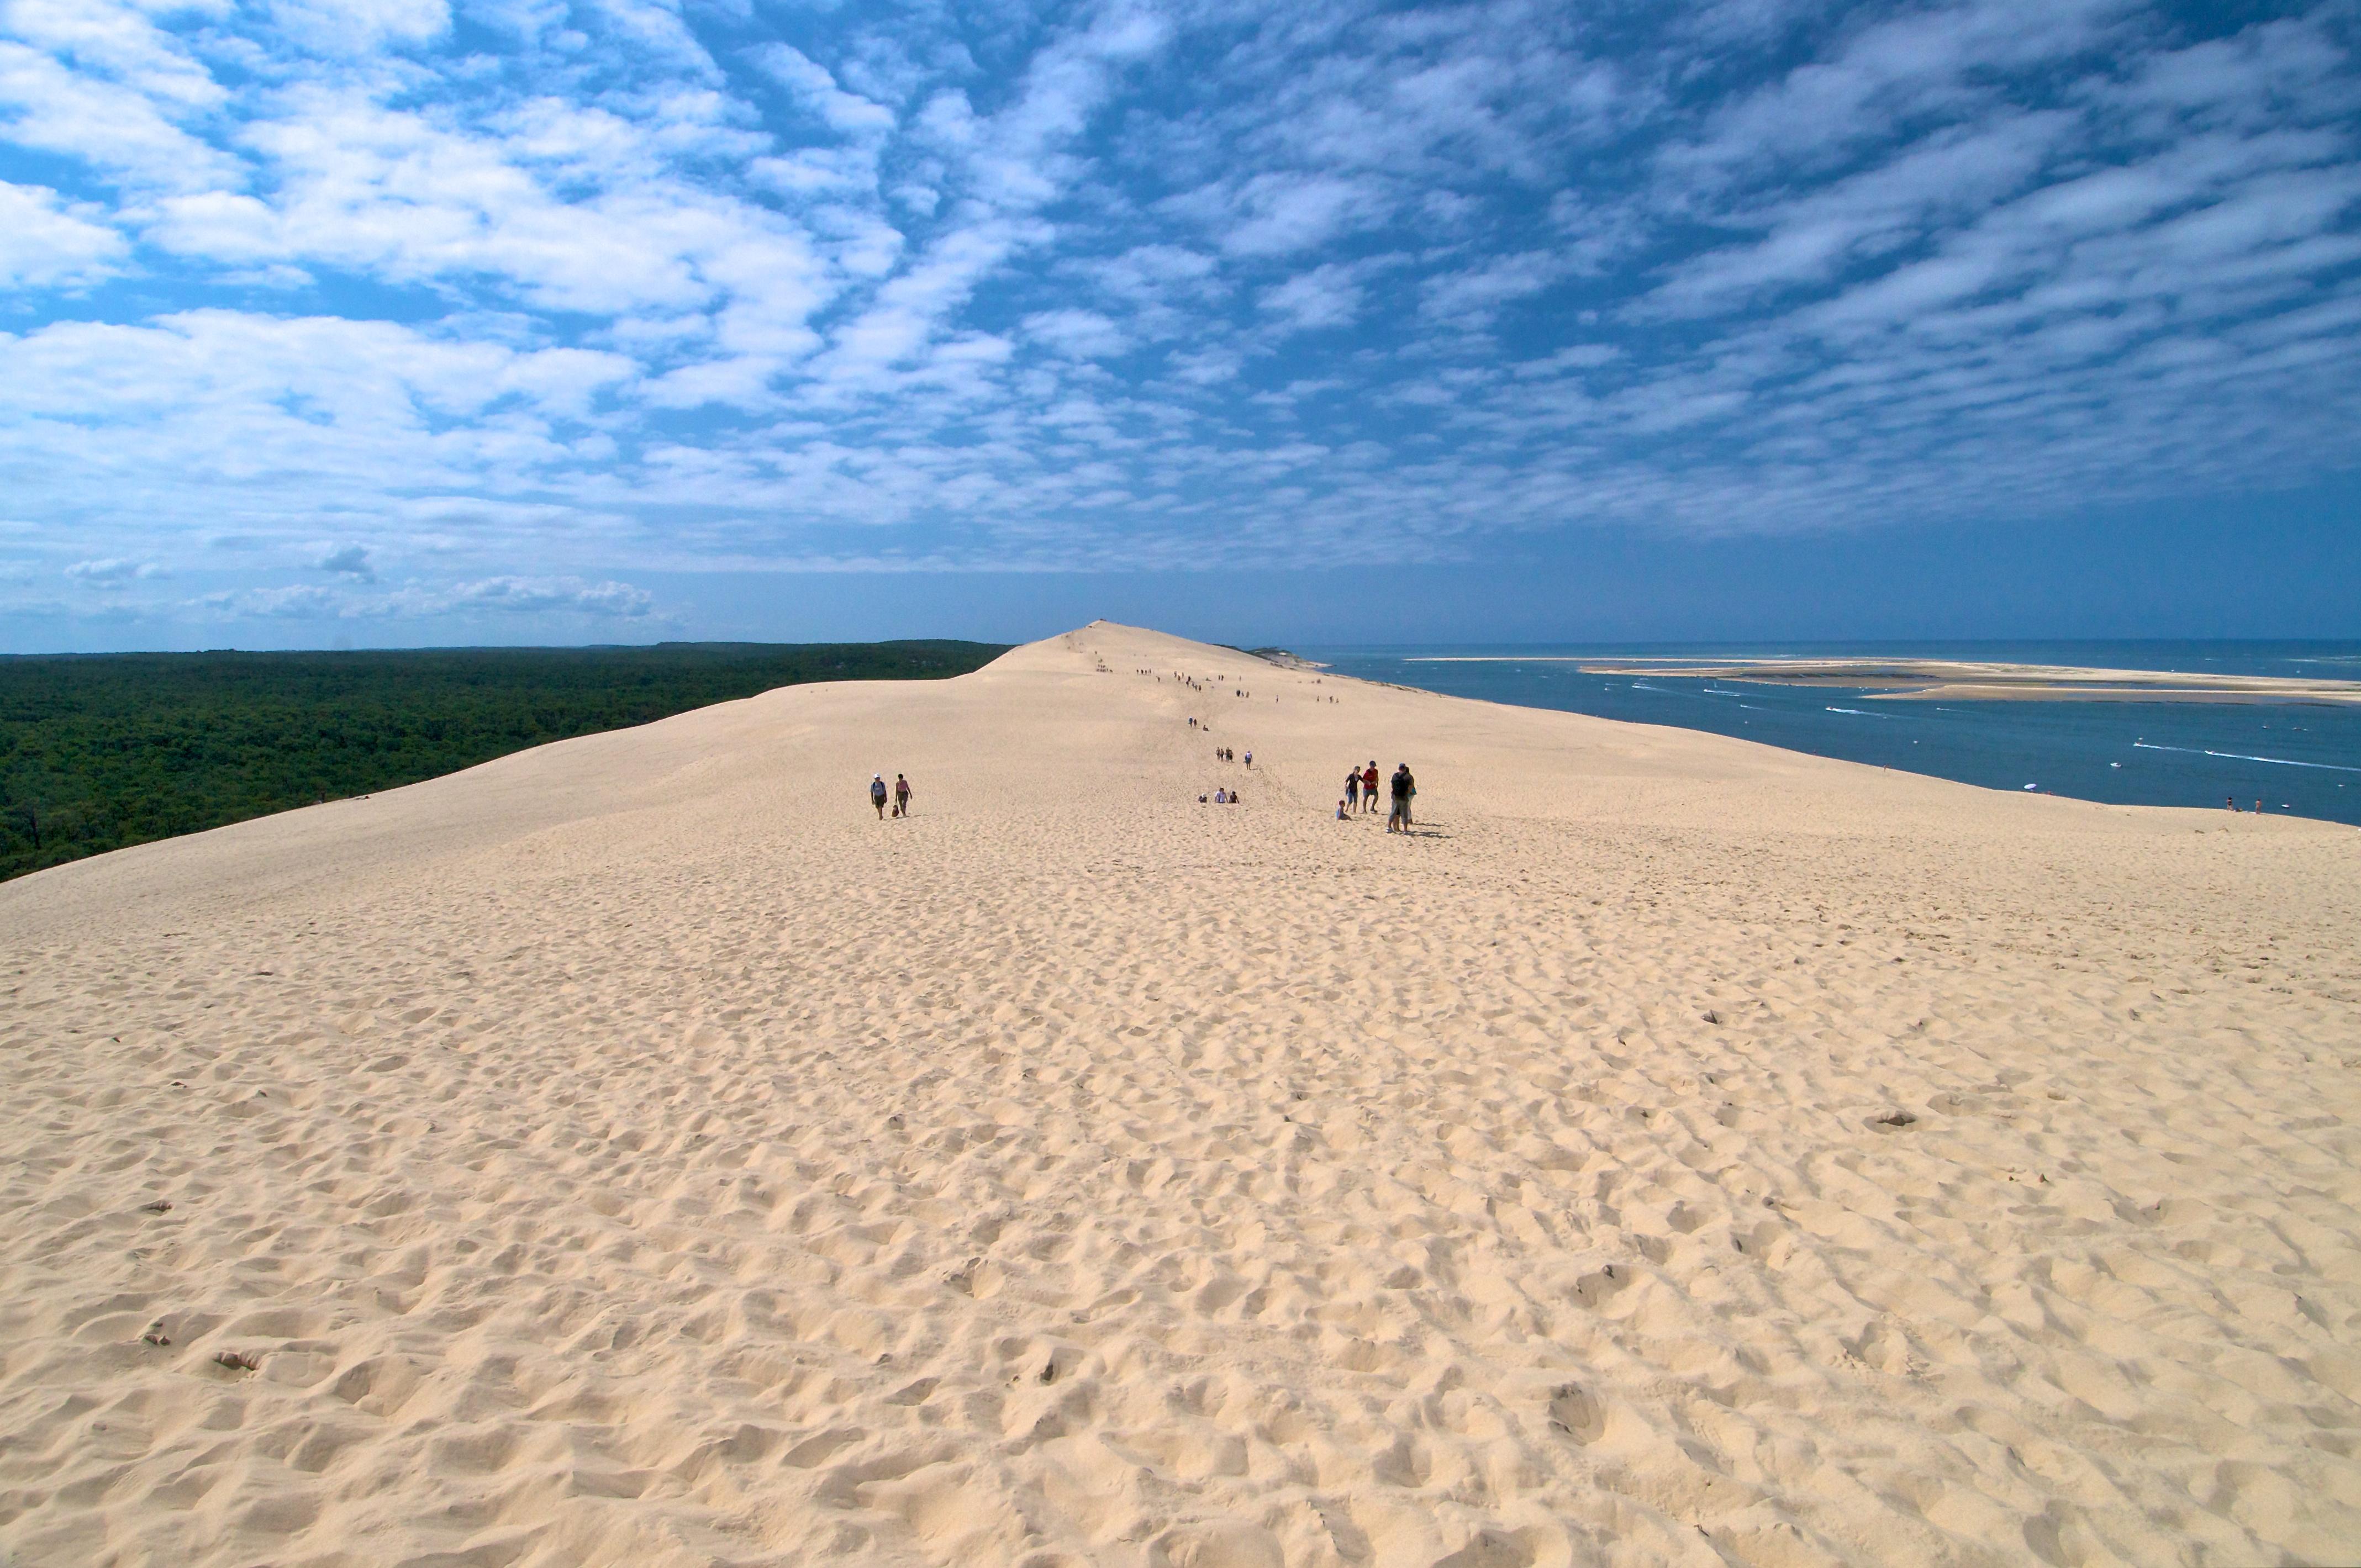 Destination southwestern france pyla sur mer the palladian traveler - Hotel dune du pilat ...